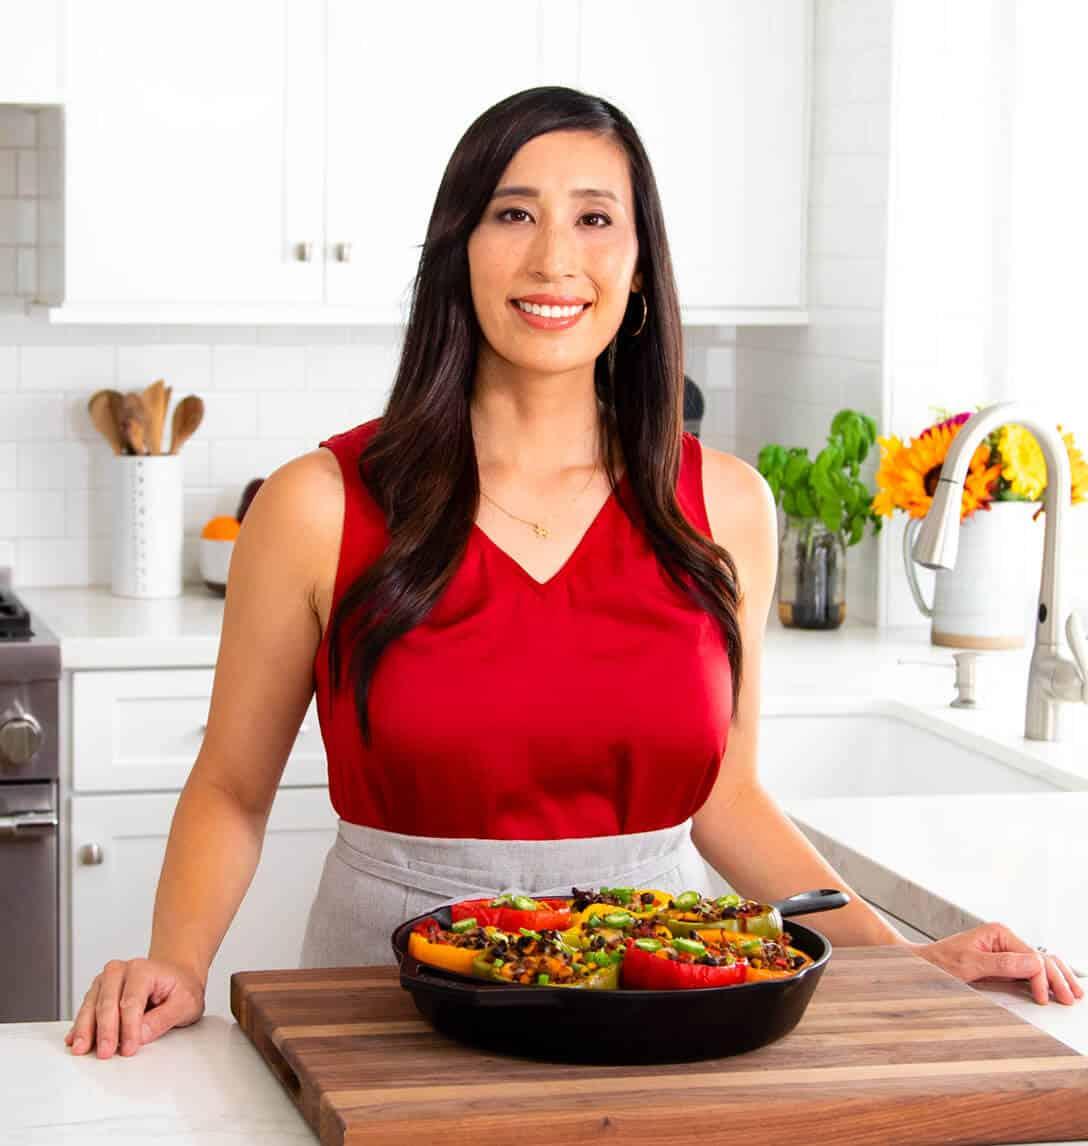 Jessica Gavin standing in the kitchen